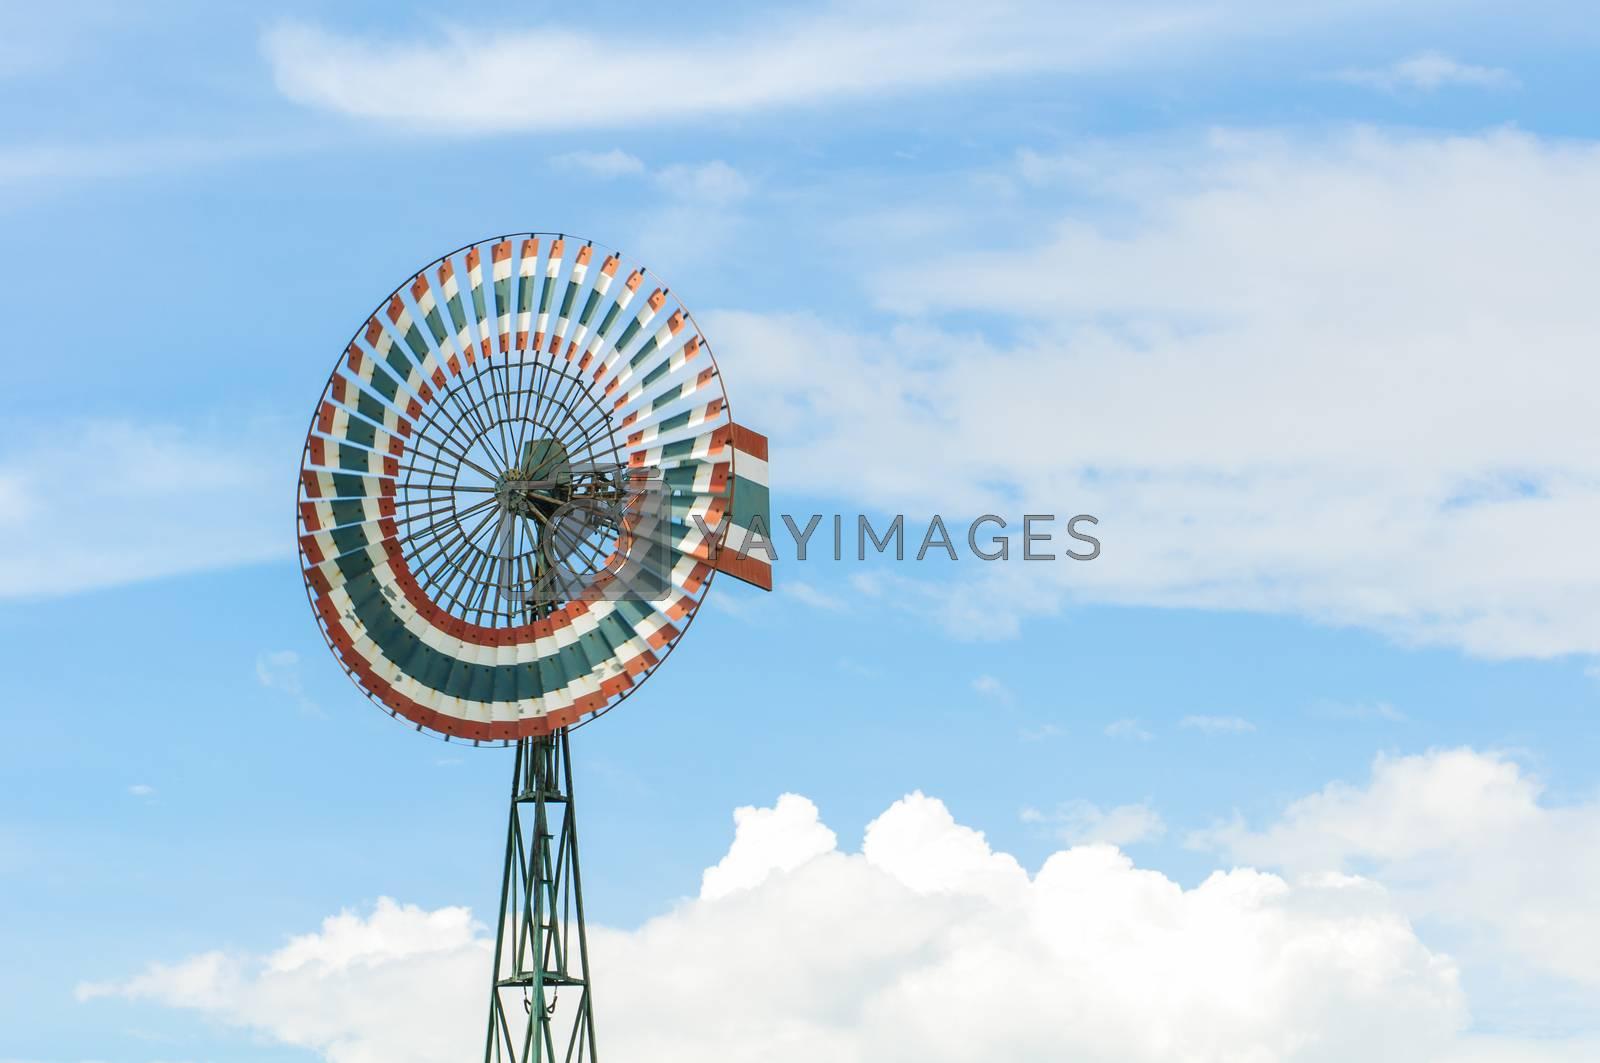 Royalty free image of Wind turbine by Sorapop